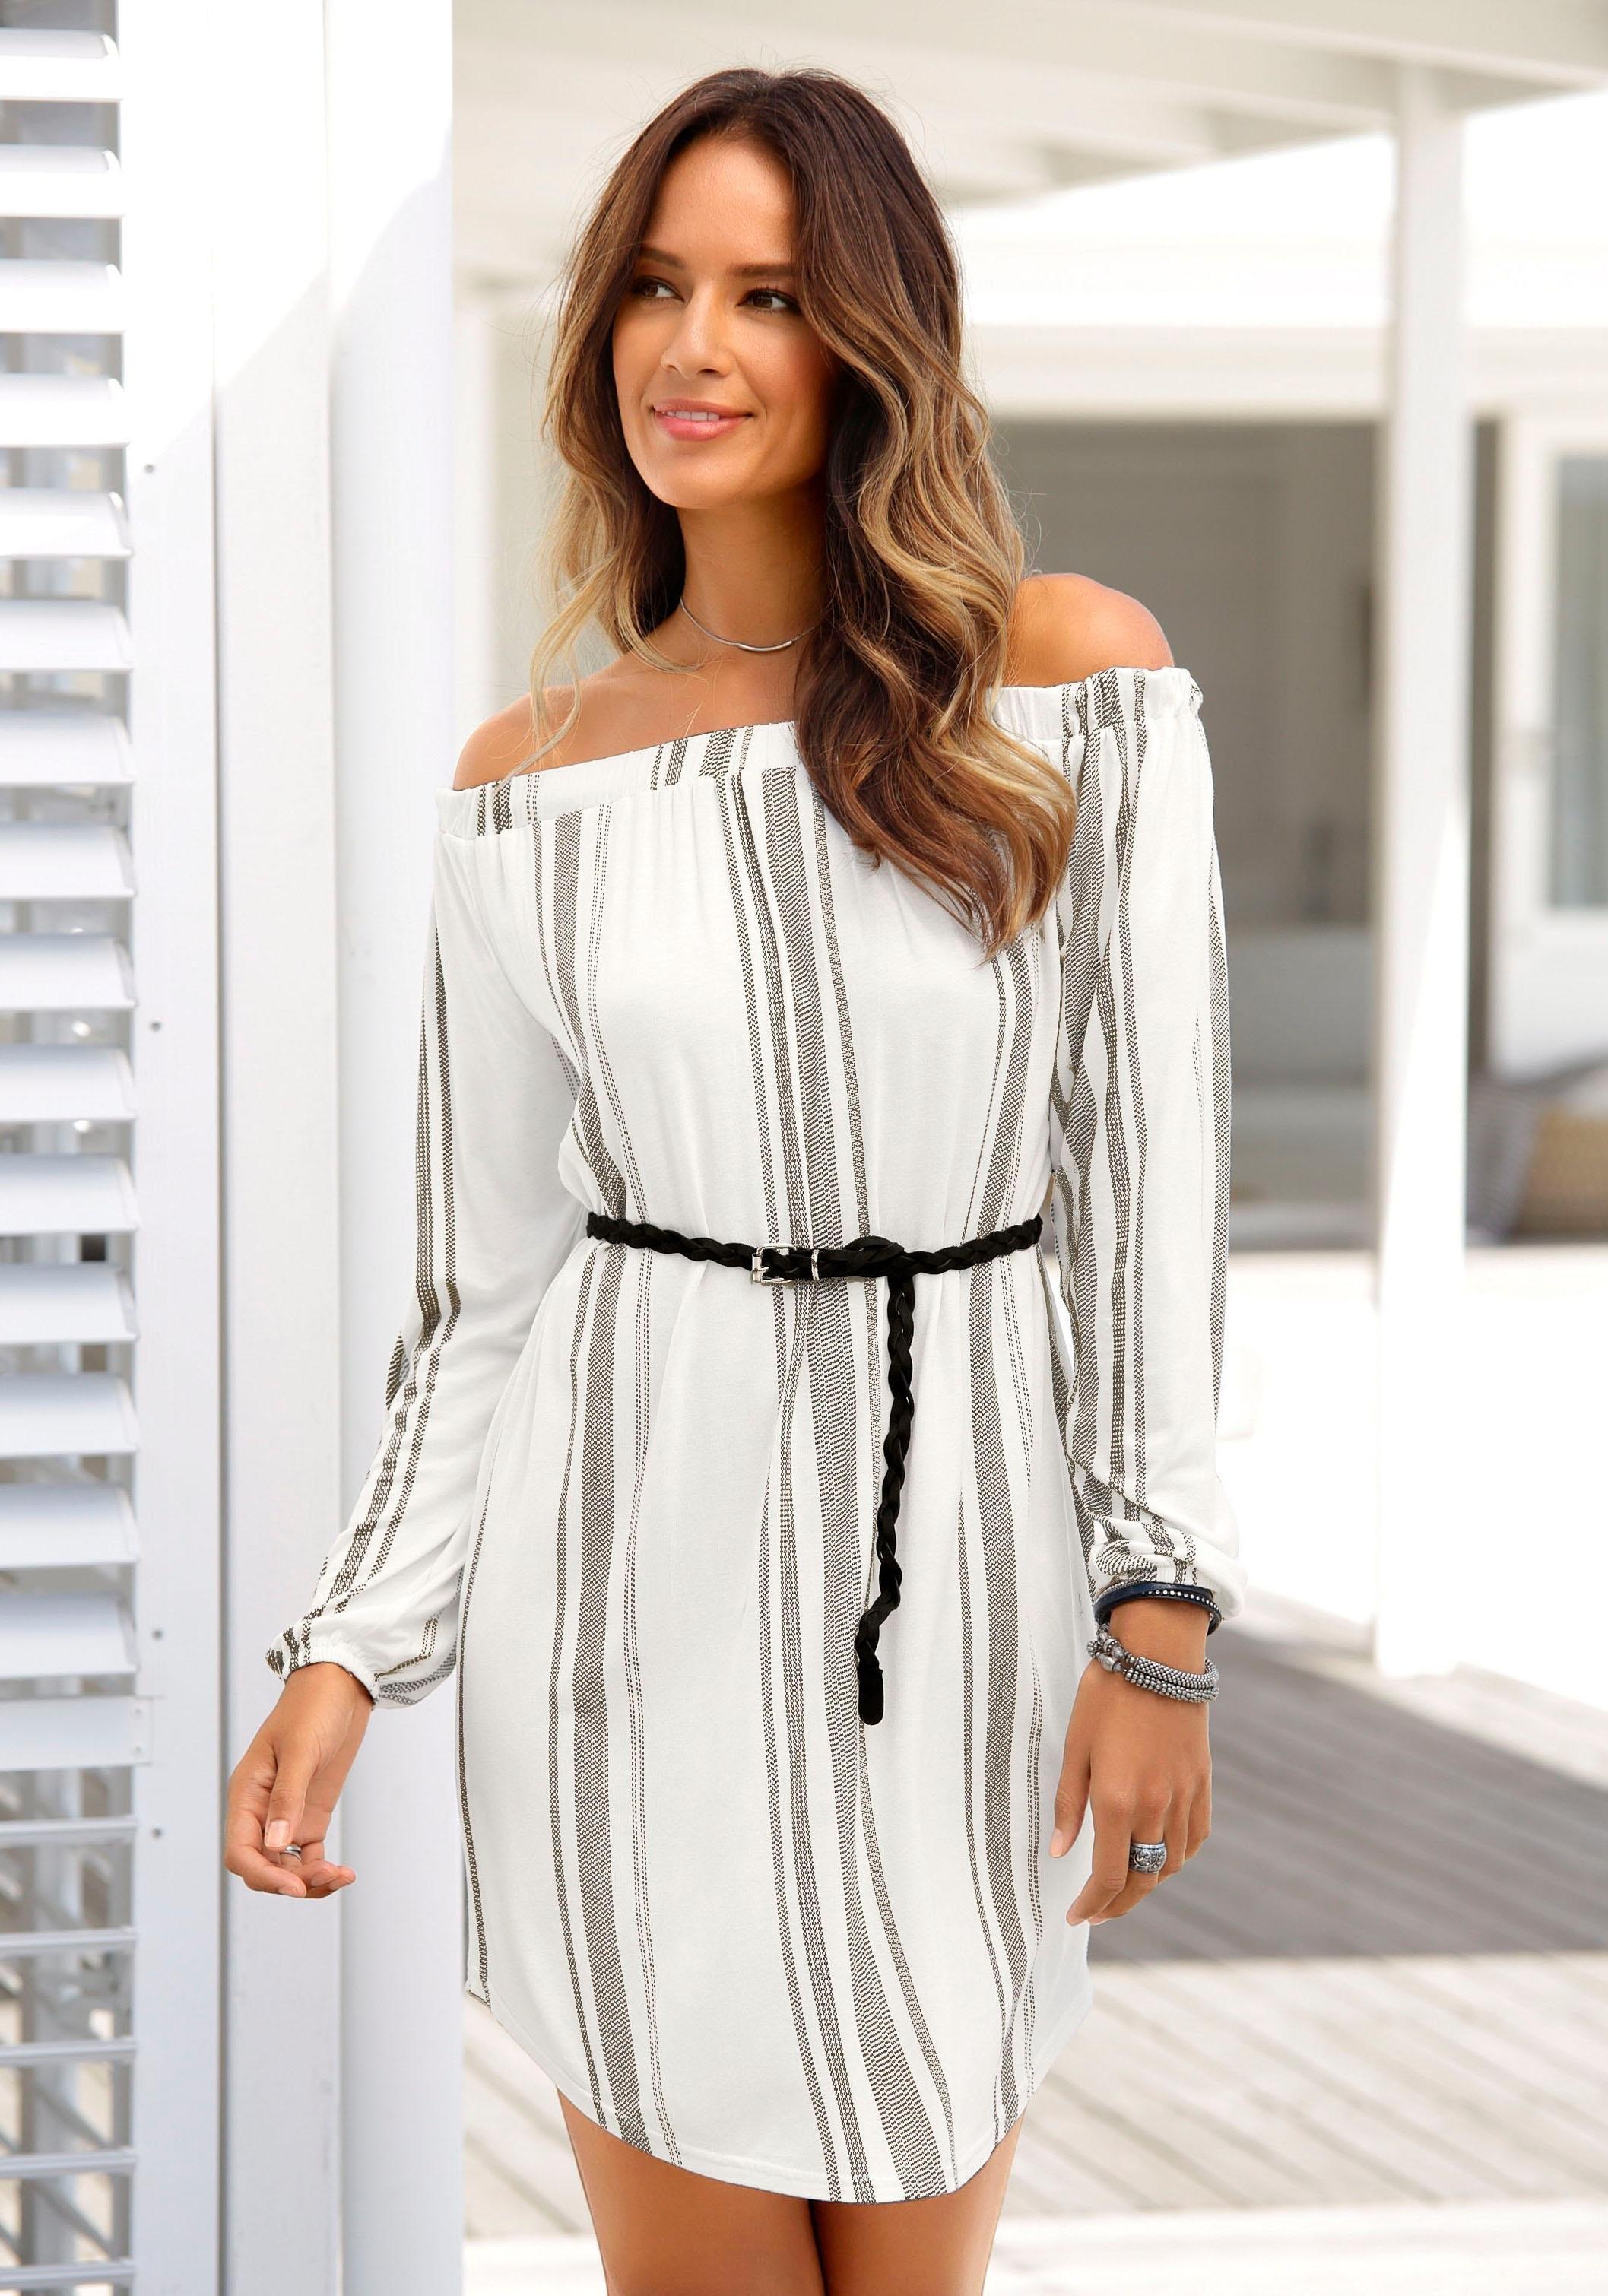 06ac1642ceb4d7 Off-shoulder jurk kopen